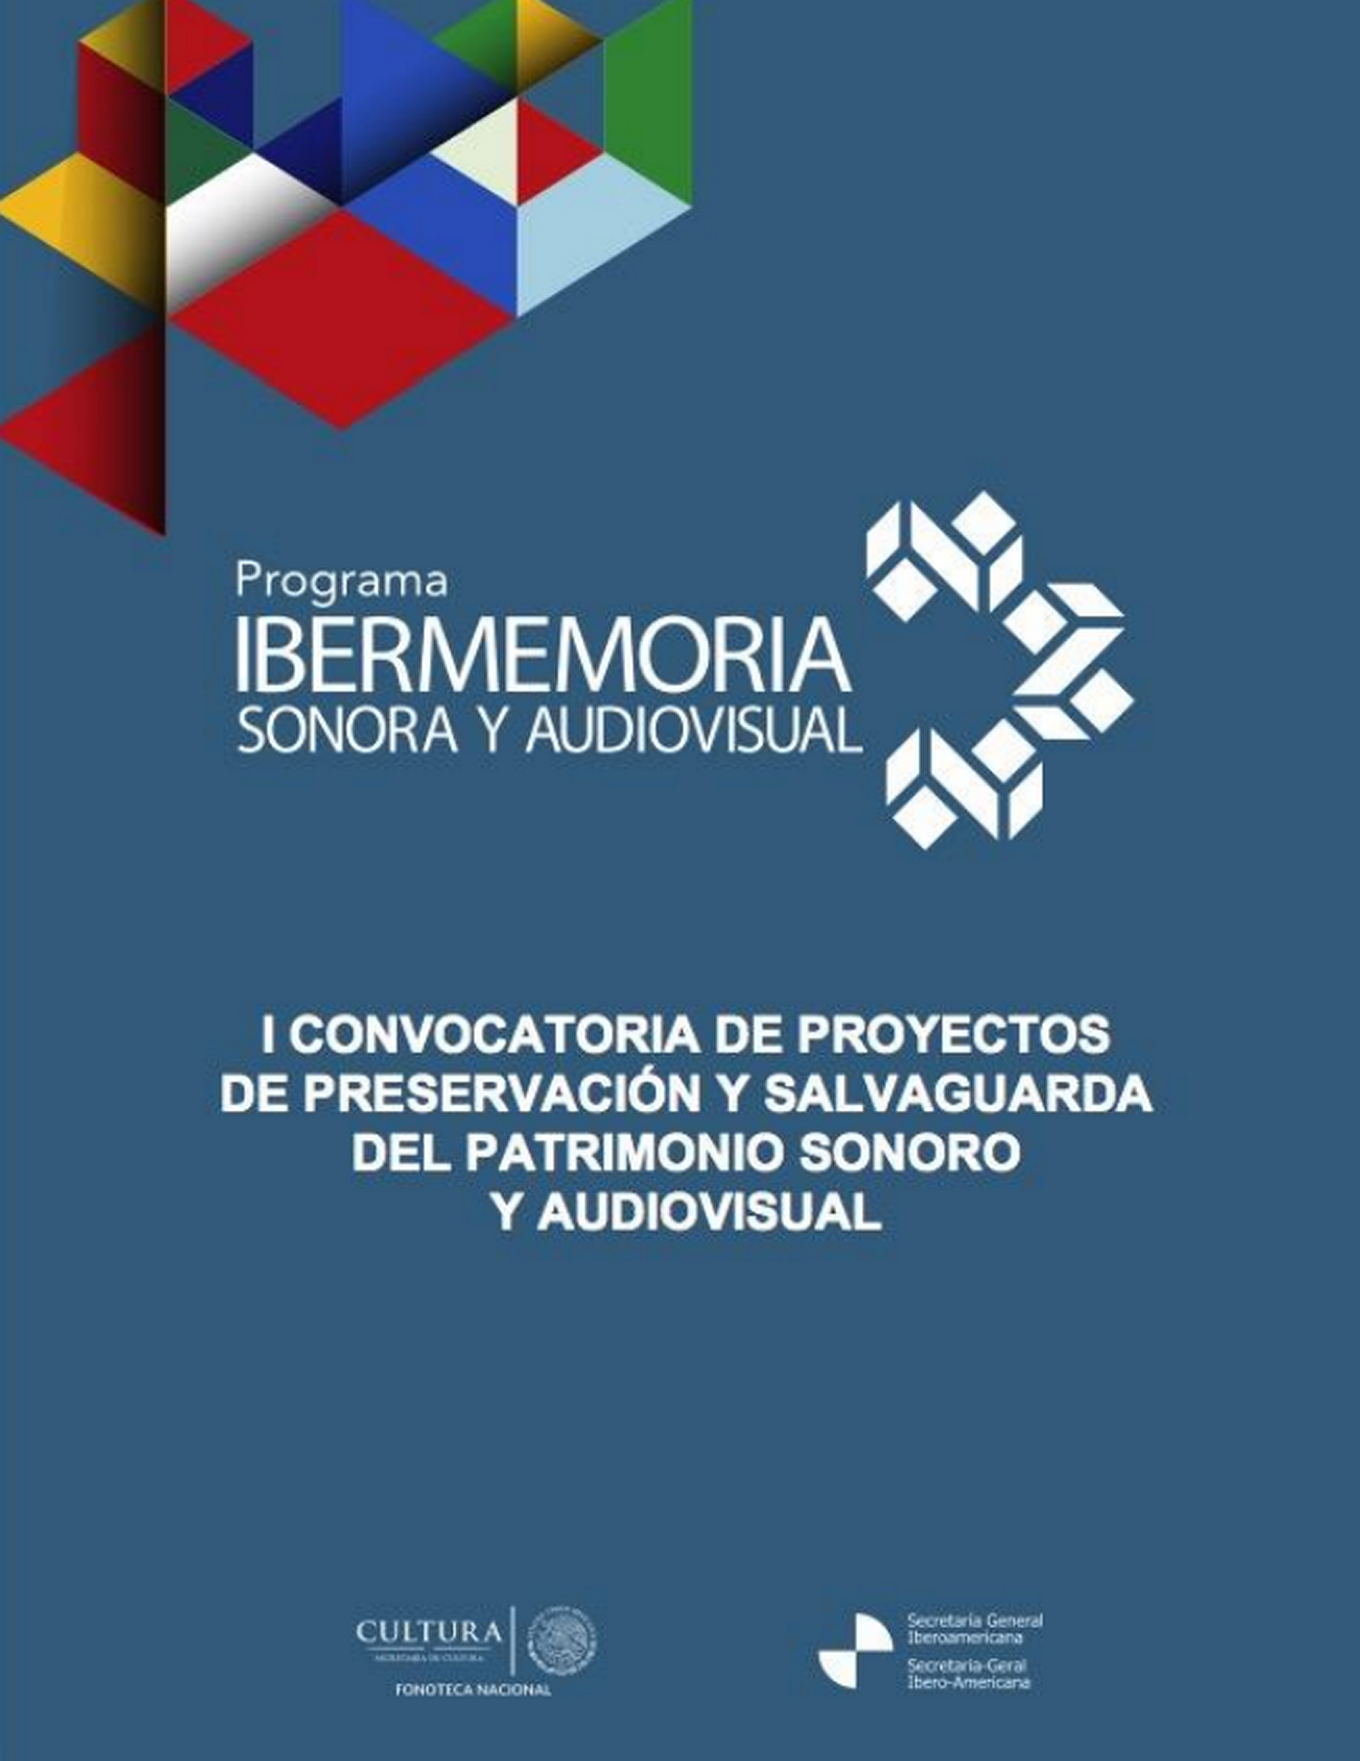 ibermemoria23